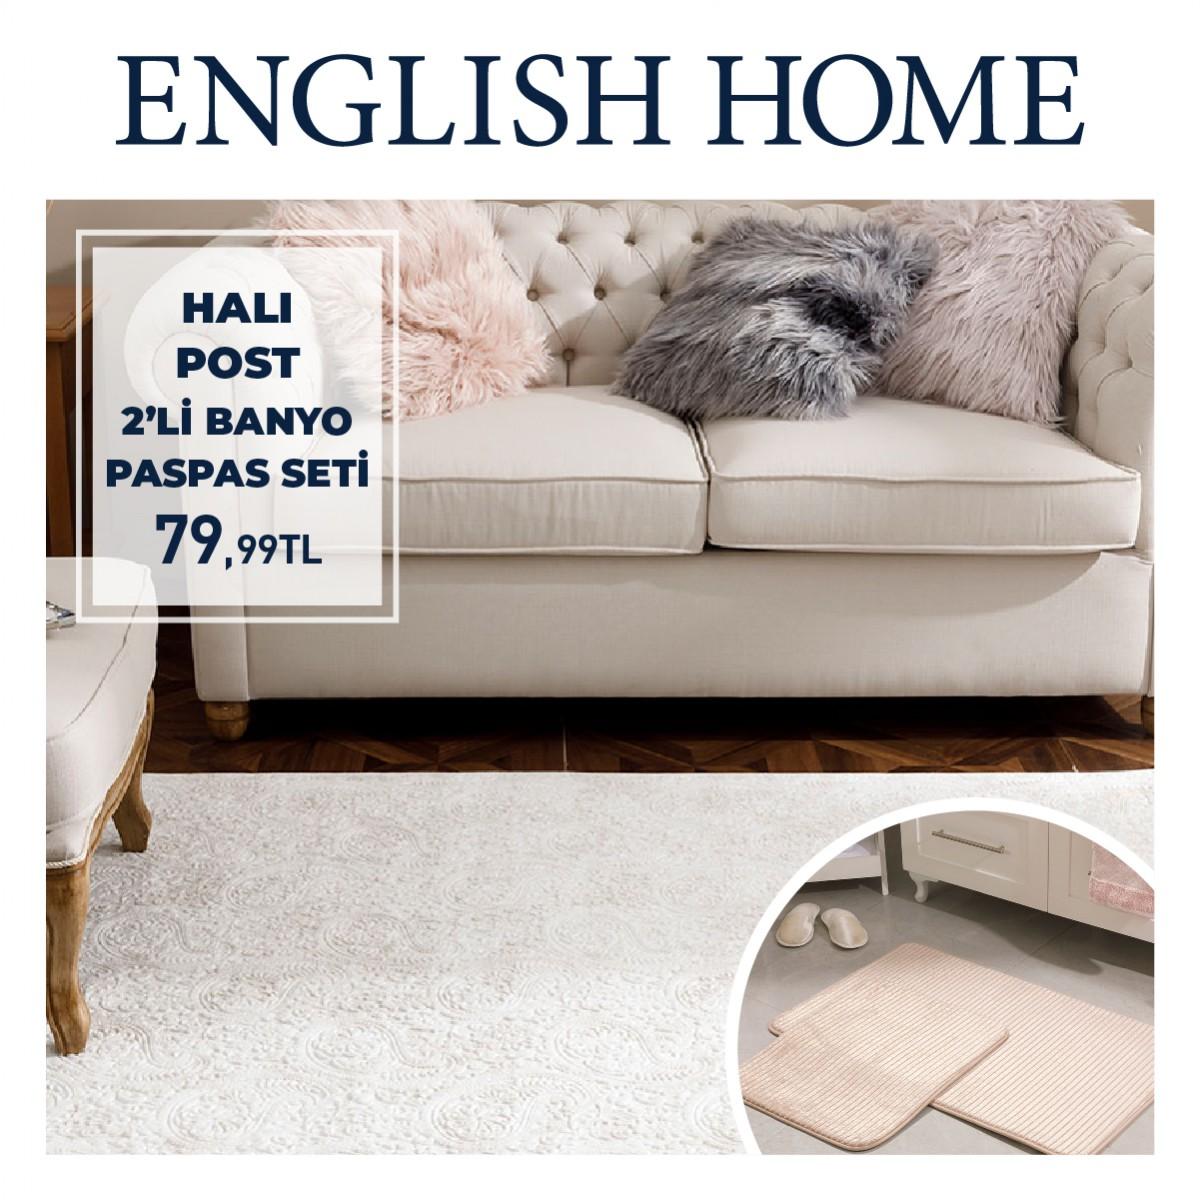 English Home'da 2'li banyo paspas seti sadece 79,99 TL!